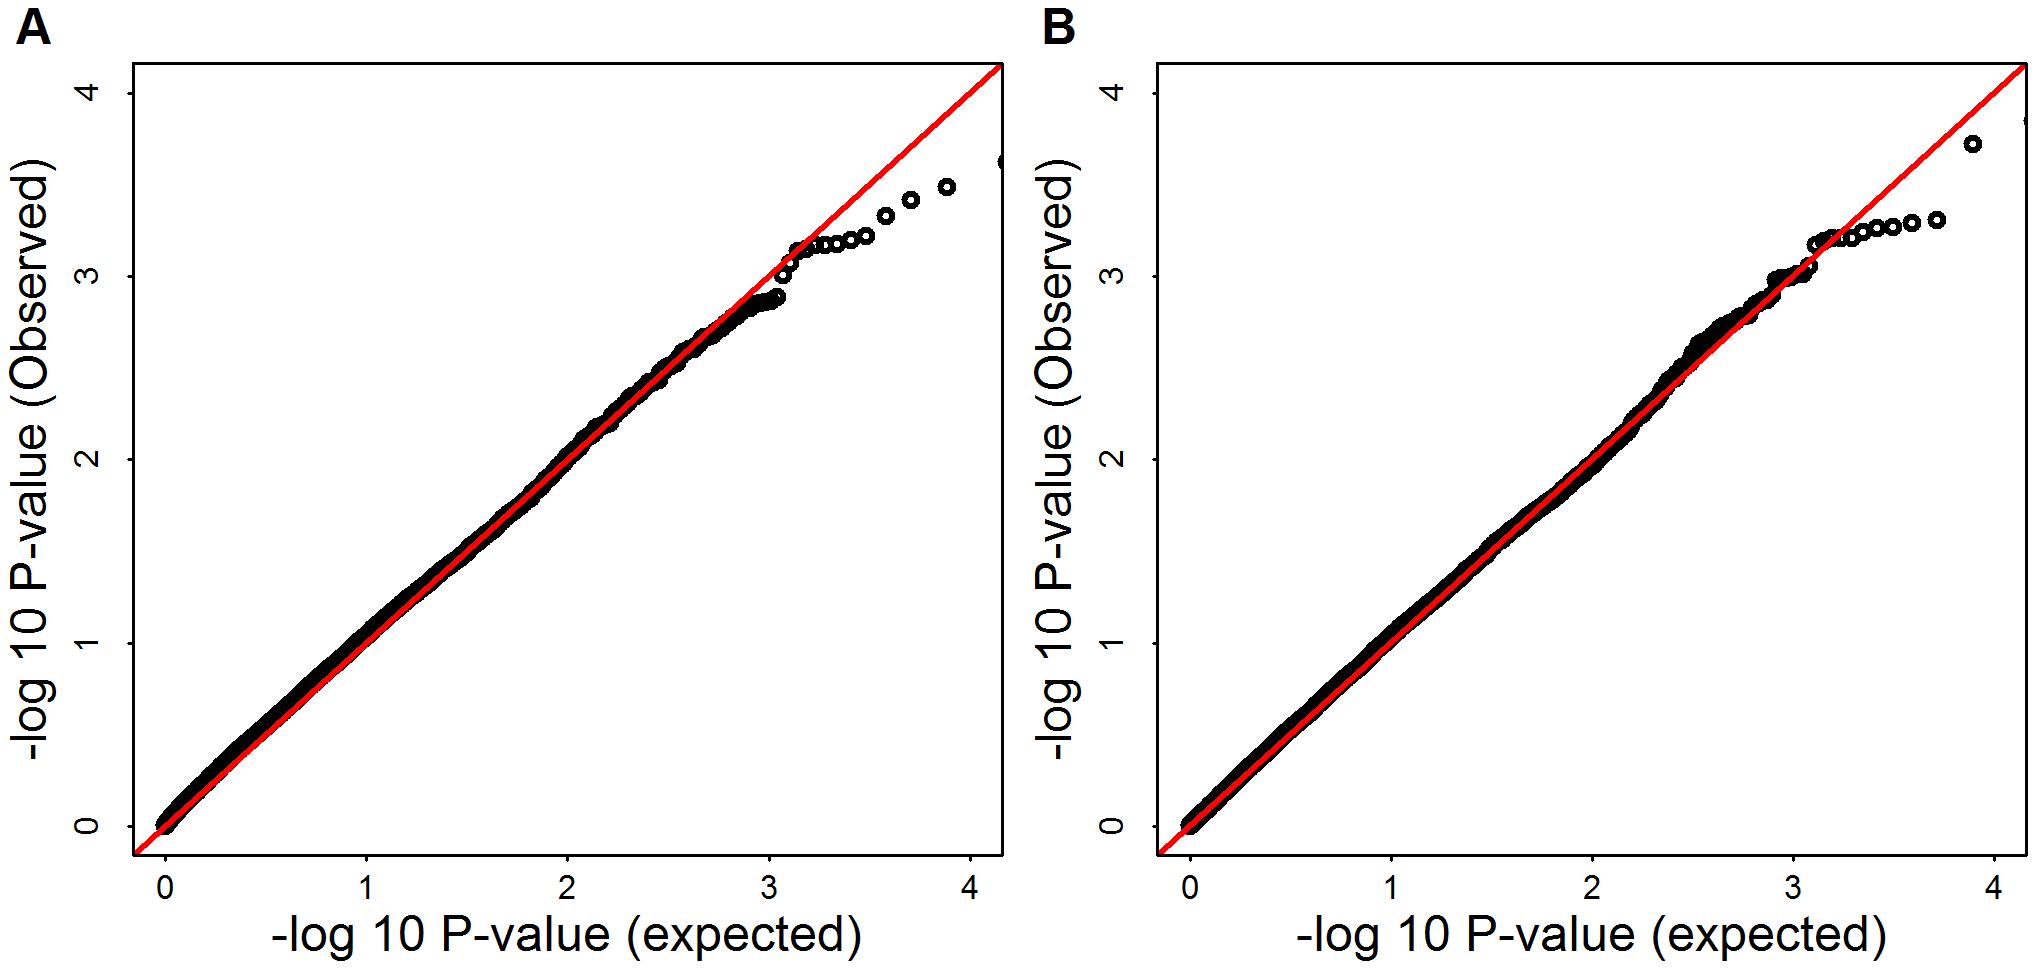 -log10(observed p-values) versus -log10(expected p-values) of SKAT and Burden test for Mega-analysis.